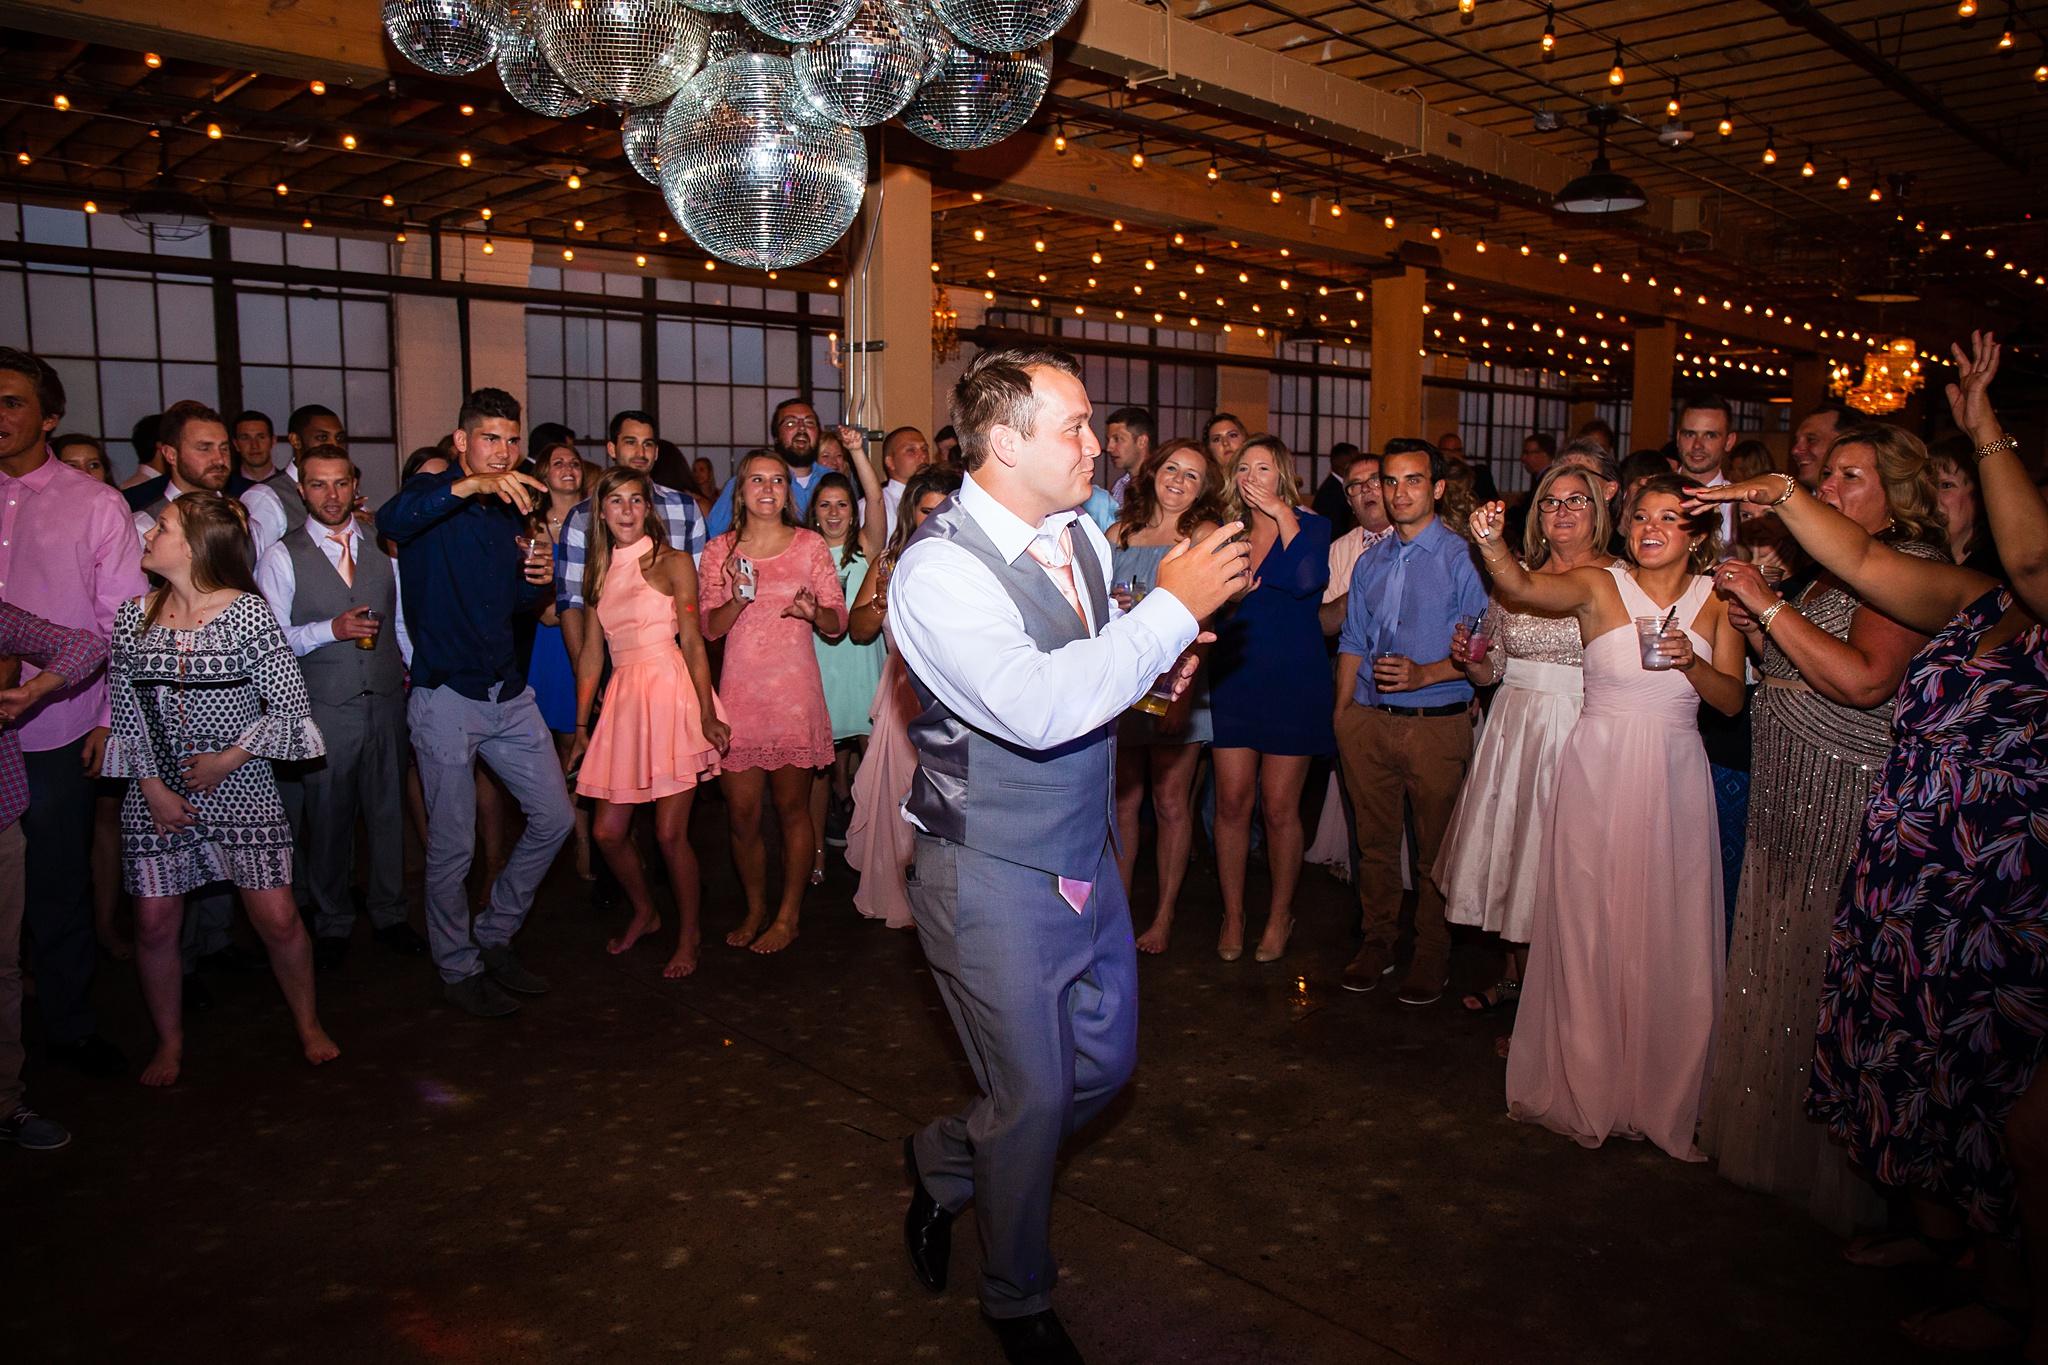 Meghan_Drew_Grand_Rapids_Cheney_place_Wedding095.JPG